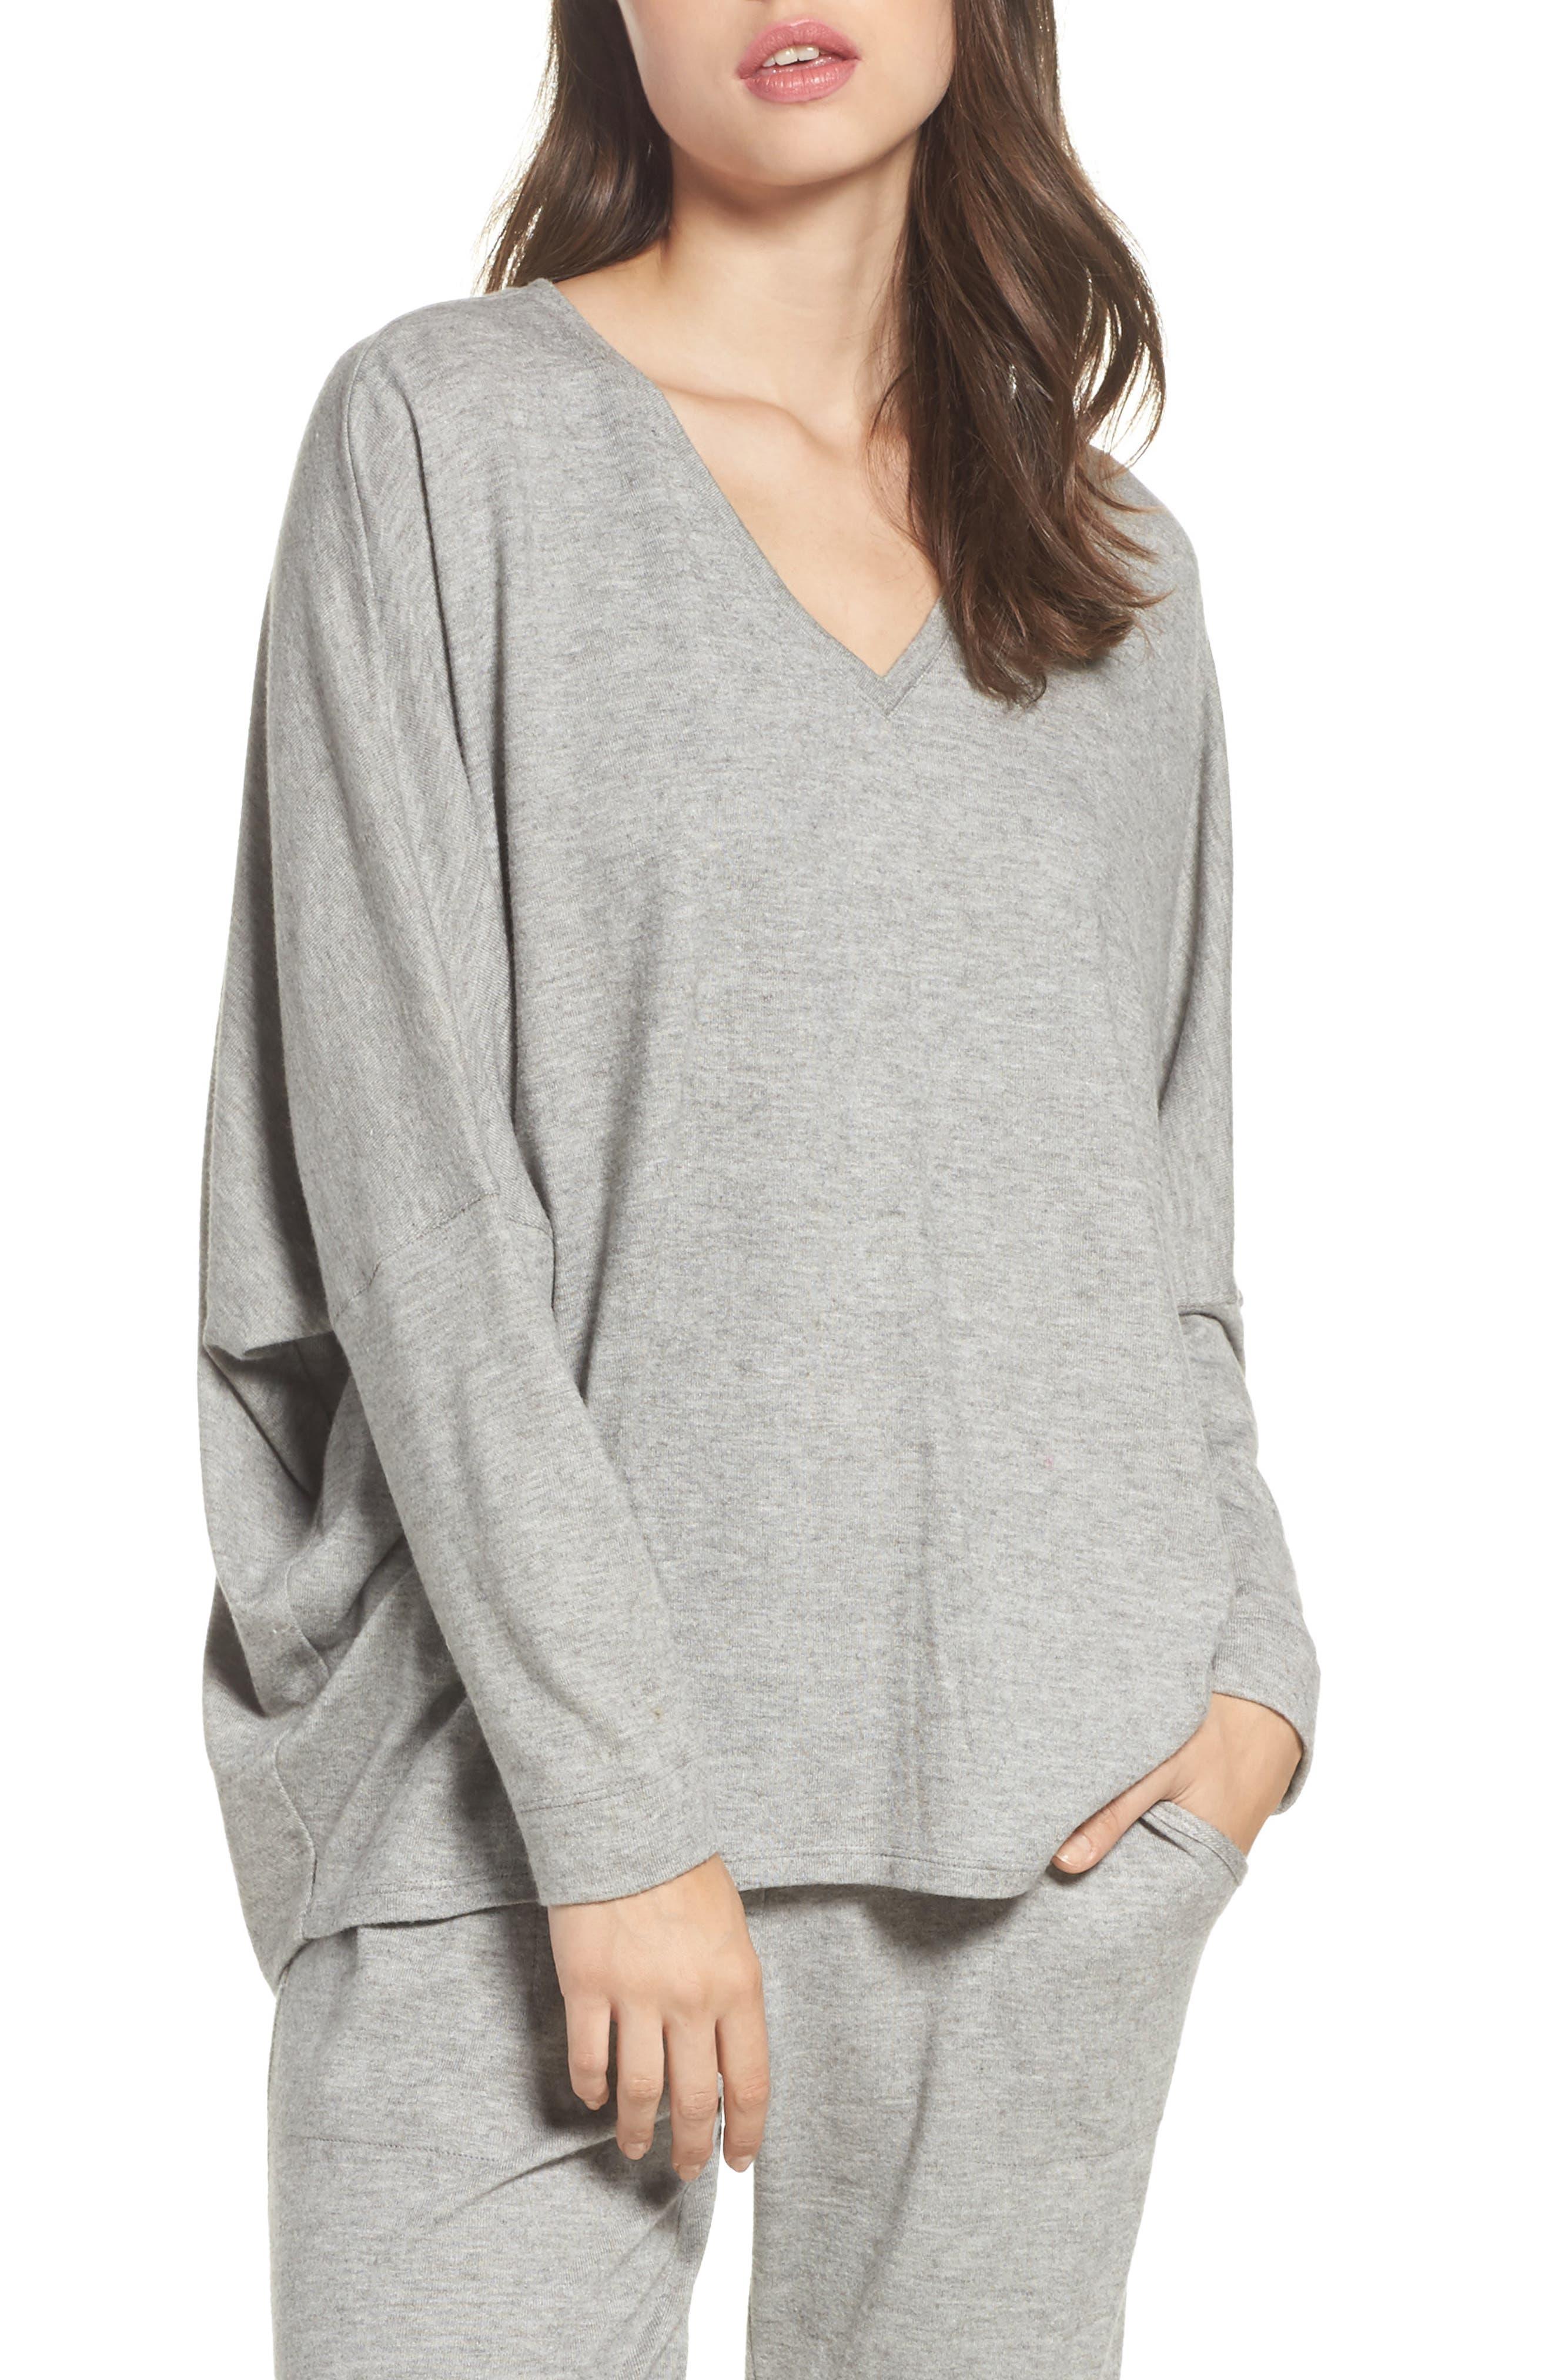 Alternate Image 1 Selected - Natori Retreat Sweater Knit Top